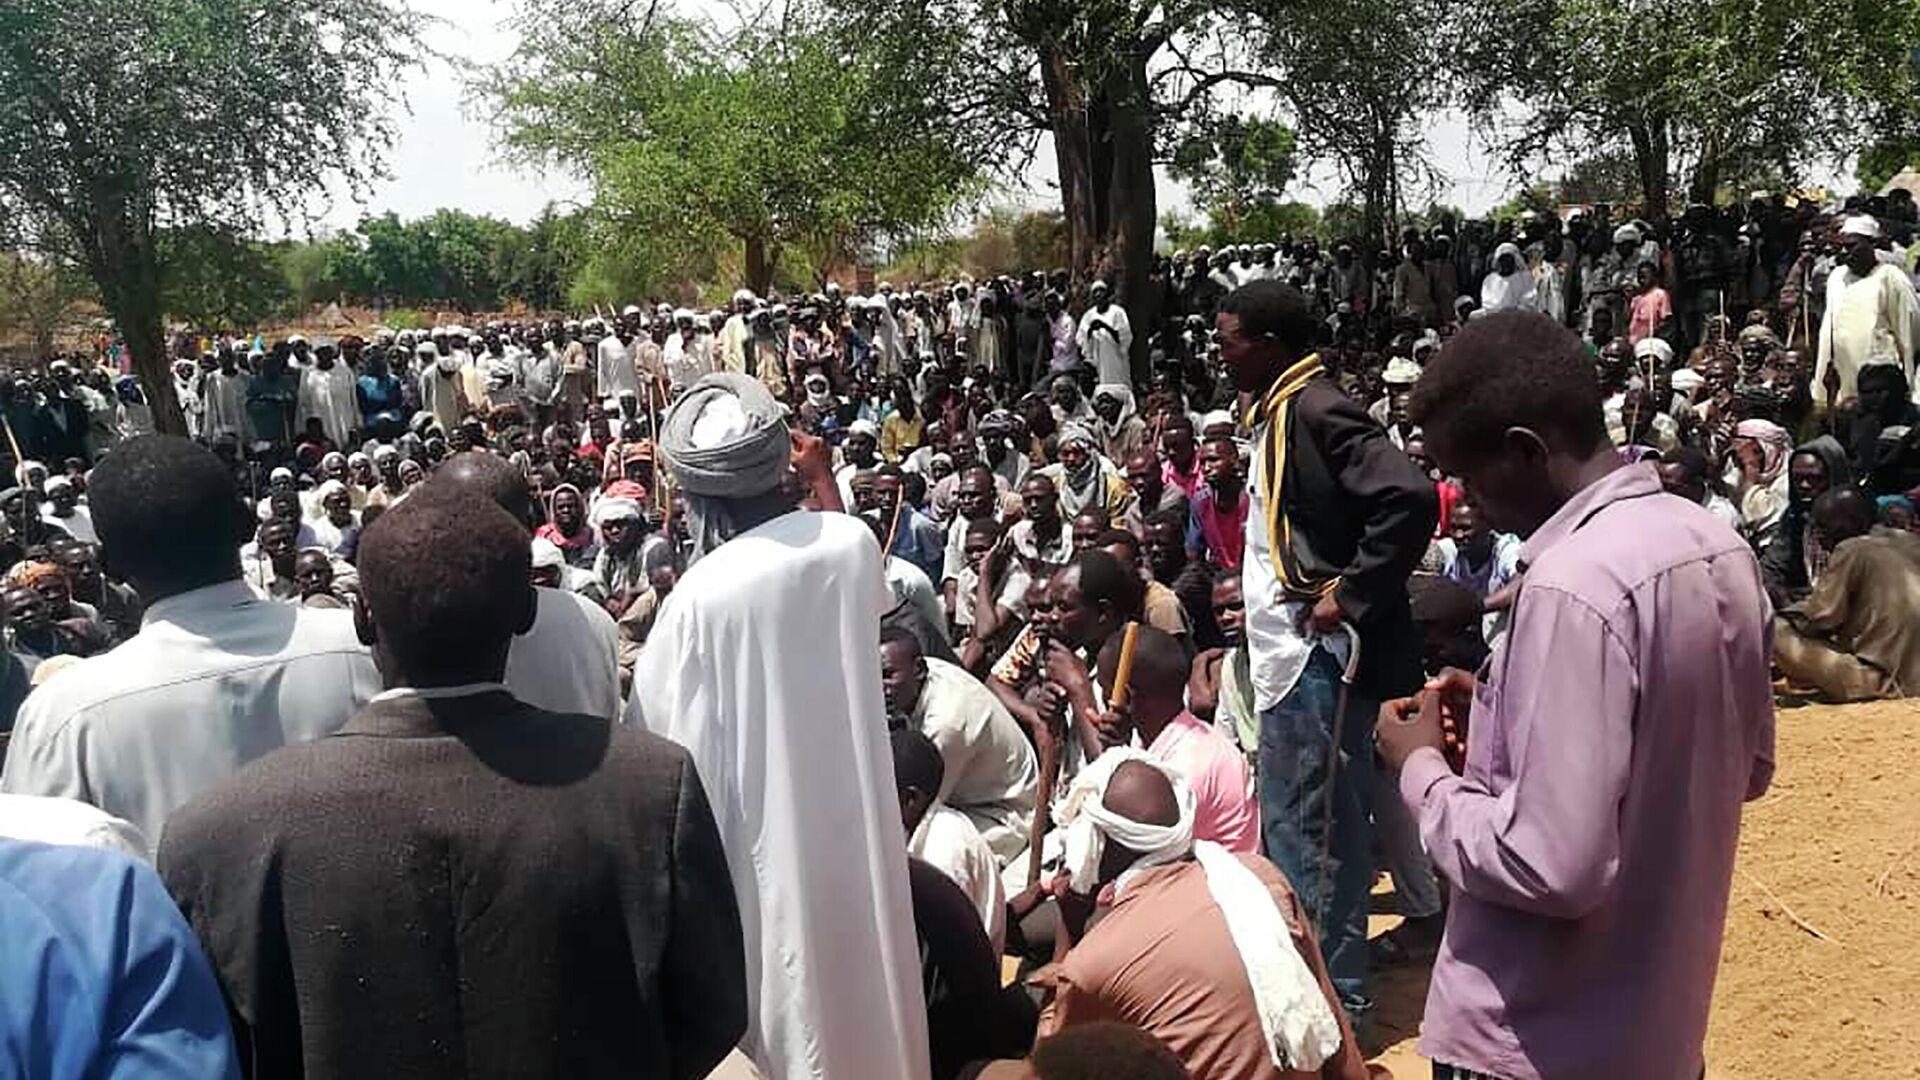 Un funeral en Darfur Occidental, Sudán - Sputnik Mundo, 1920, 09.04.2021